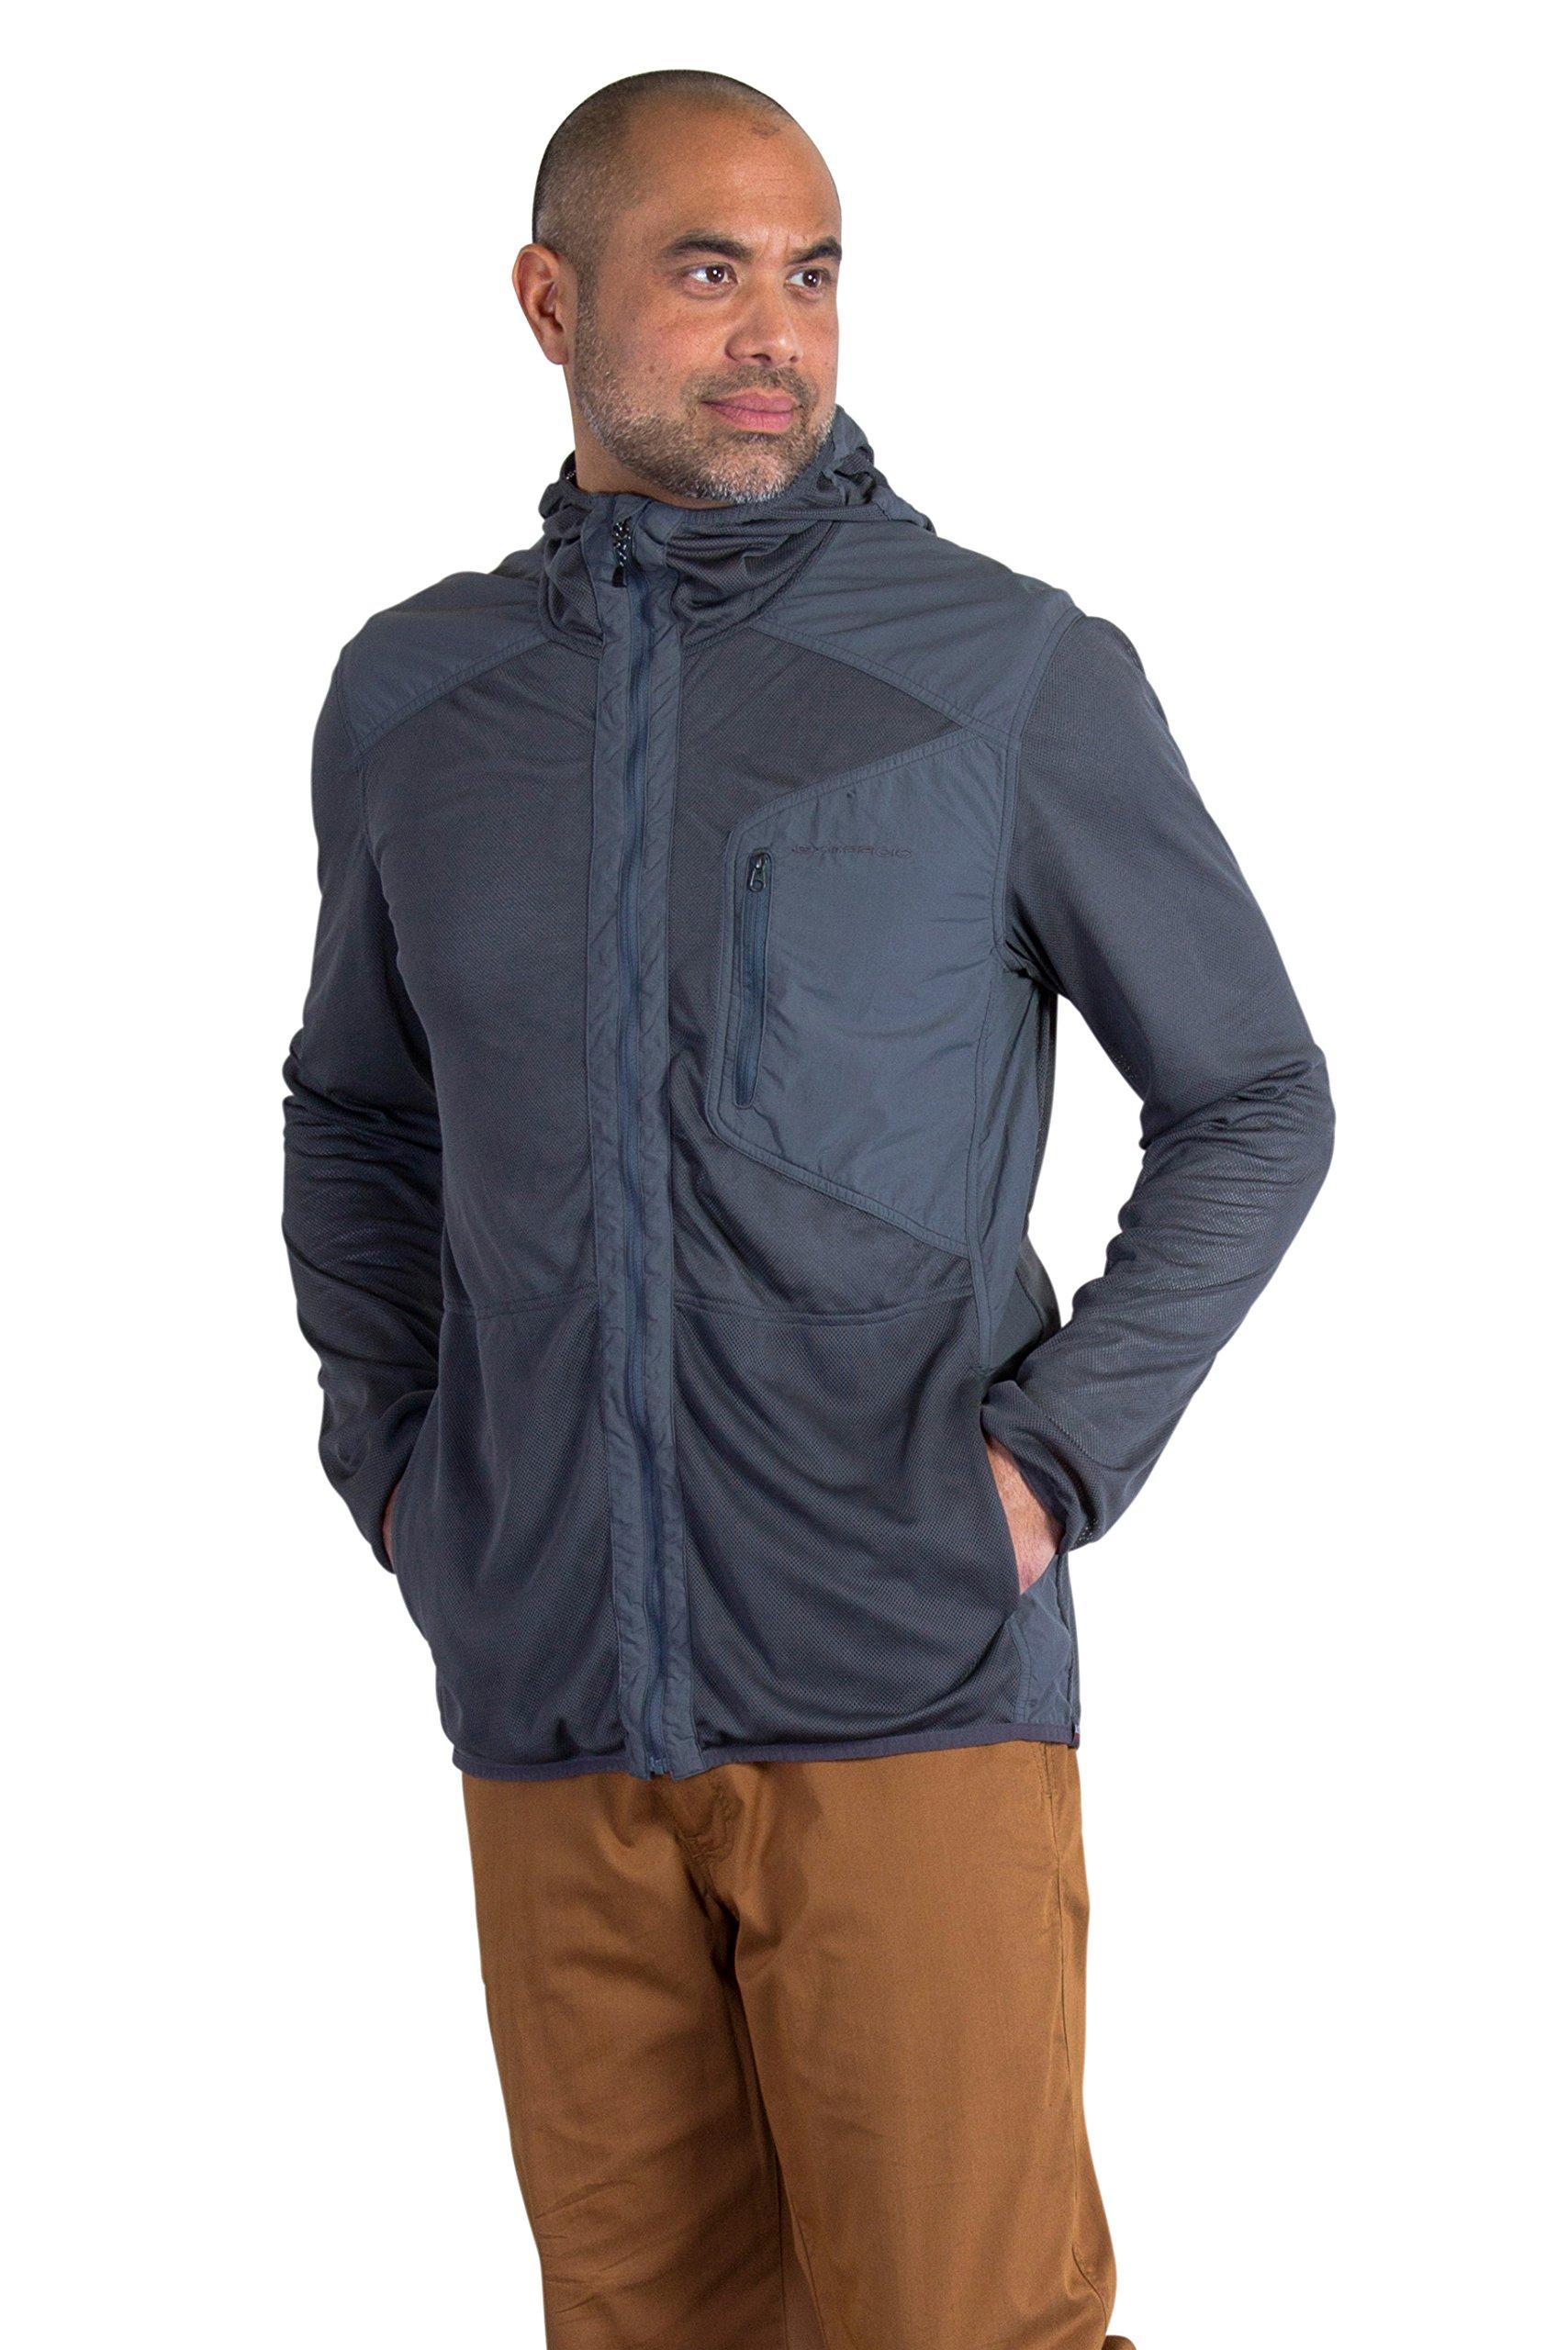 ExOfficio Men's BugsAway Sandfly Lightweight Jacket-Insect, Tick, Mosquito Repellent Permethrin Clothing